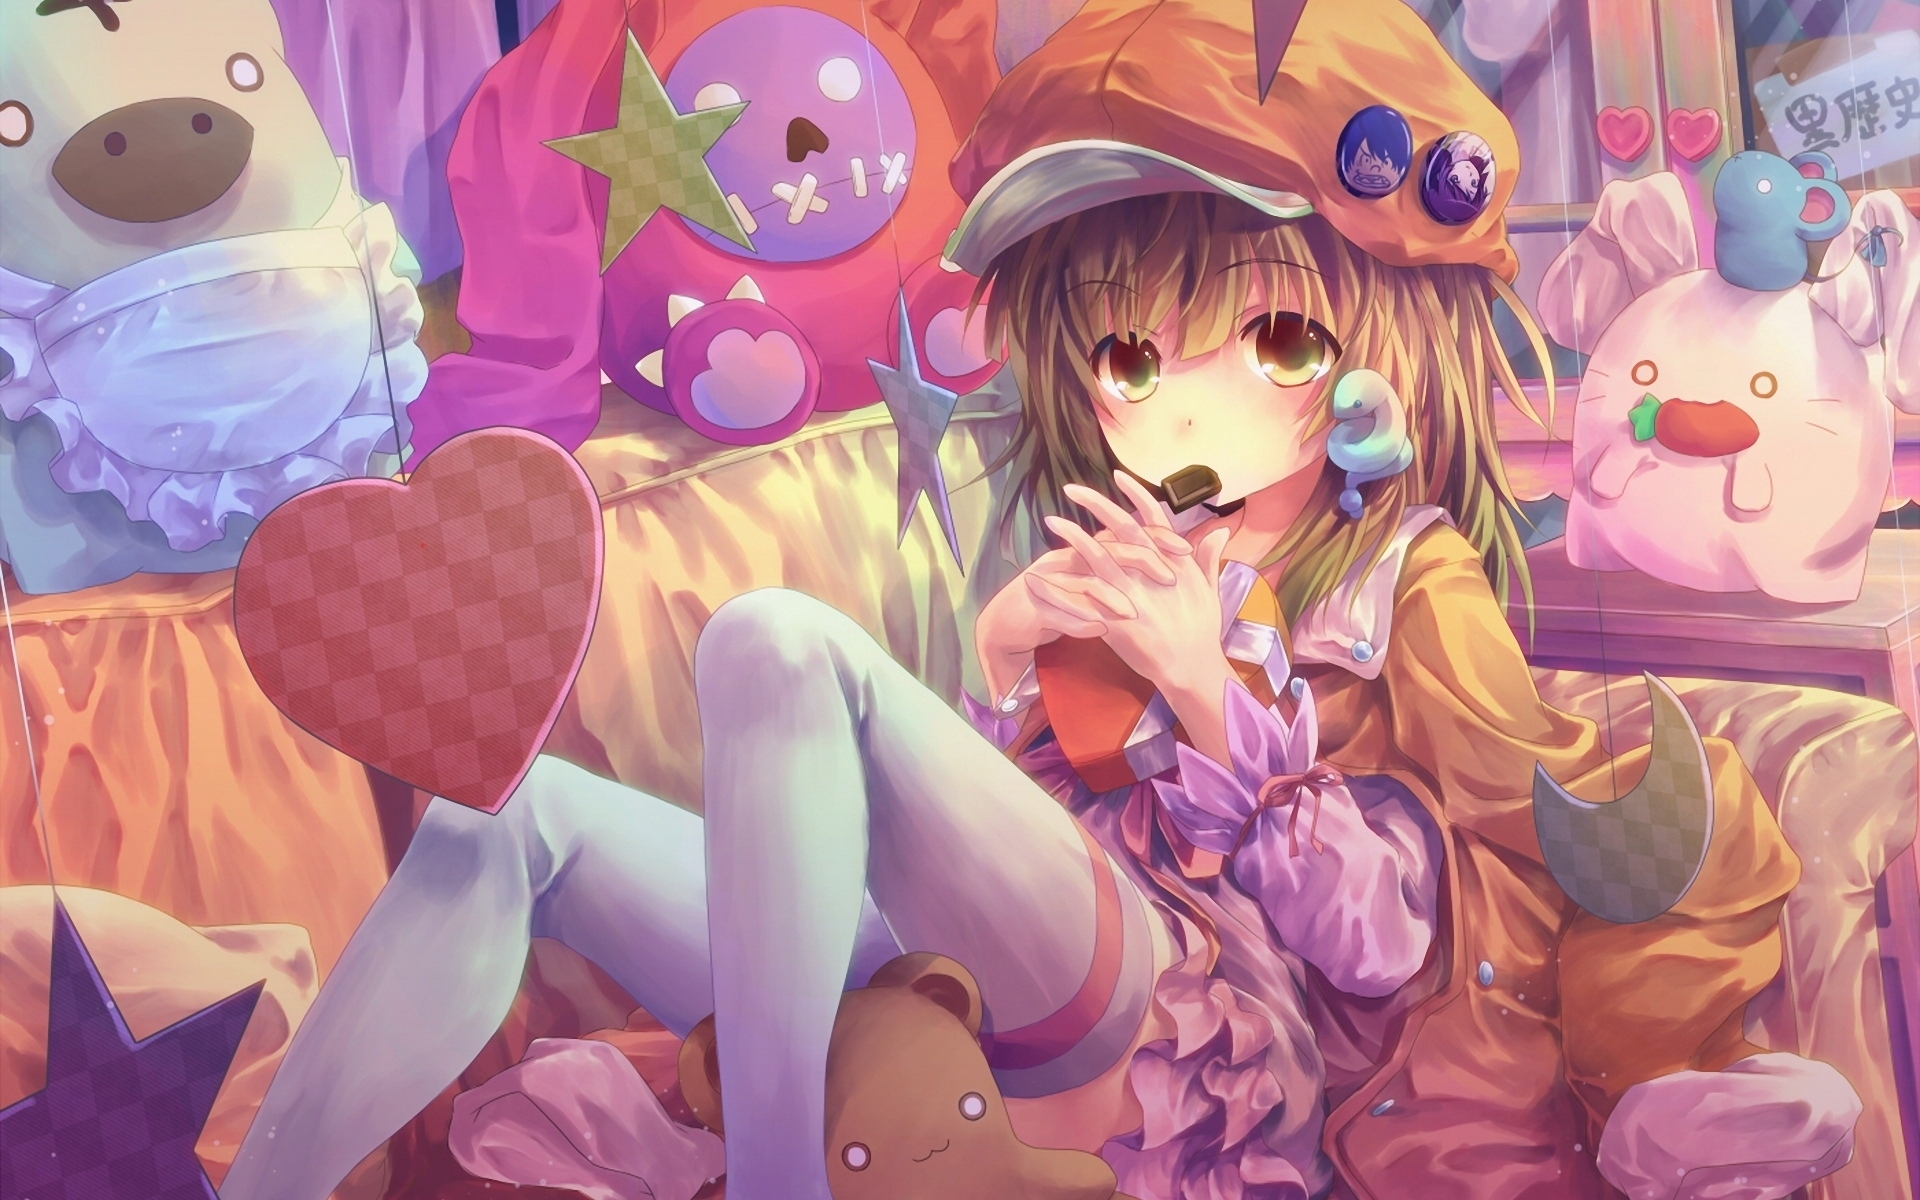 Cute Anime Girl 5139 Hd Wallpaper